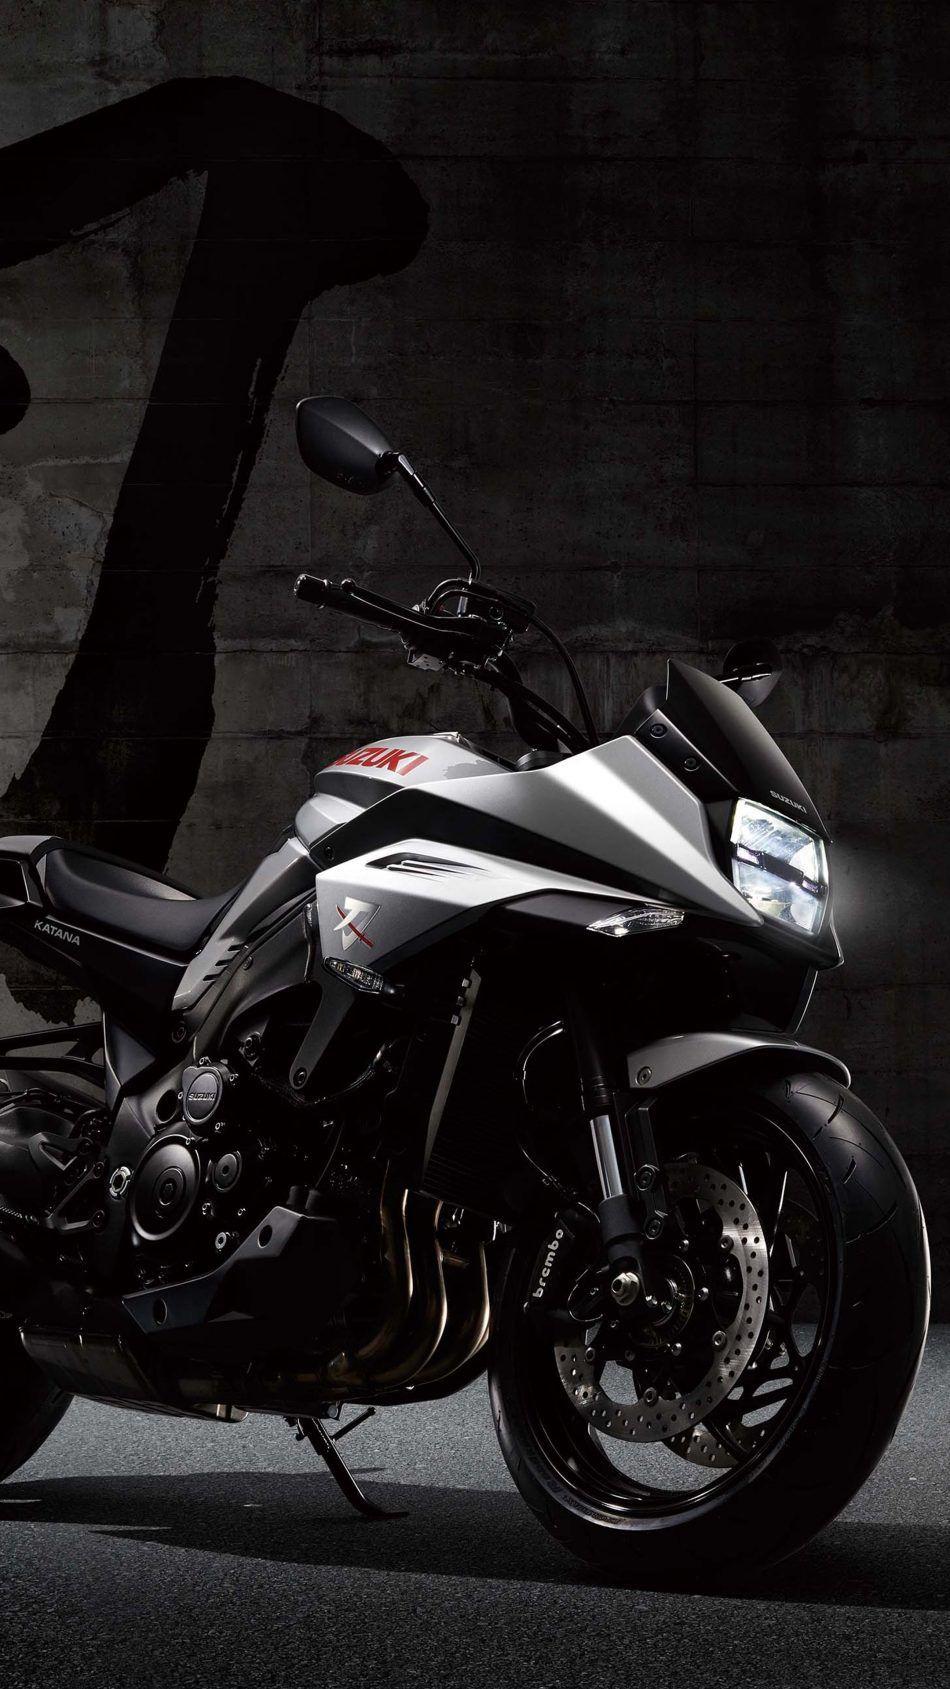 Suzuki Katana Sports Bike 4k Ultra Hd Mobile Wallpaper スズキ カタナ カタナ スズキ